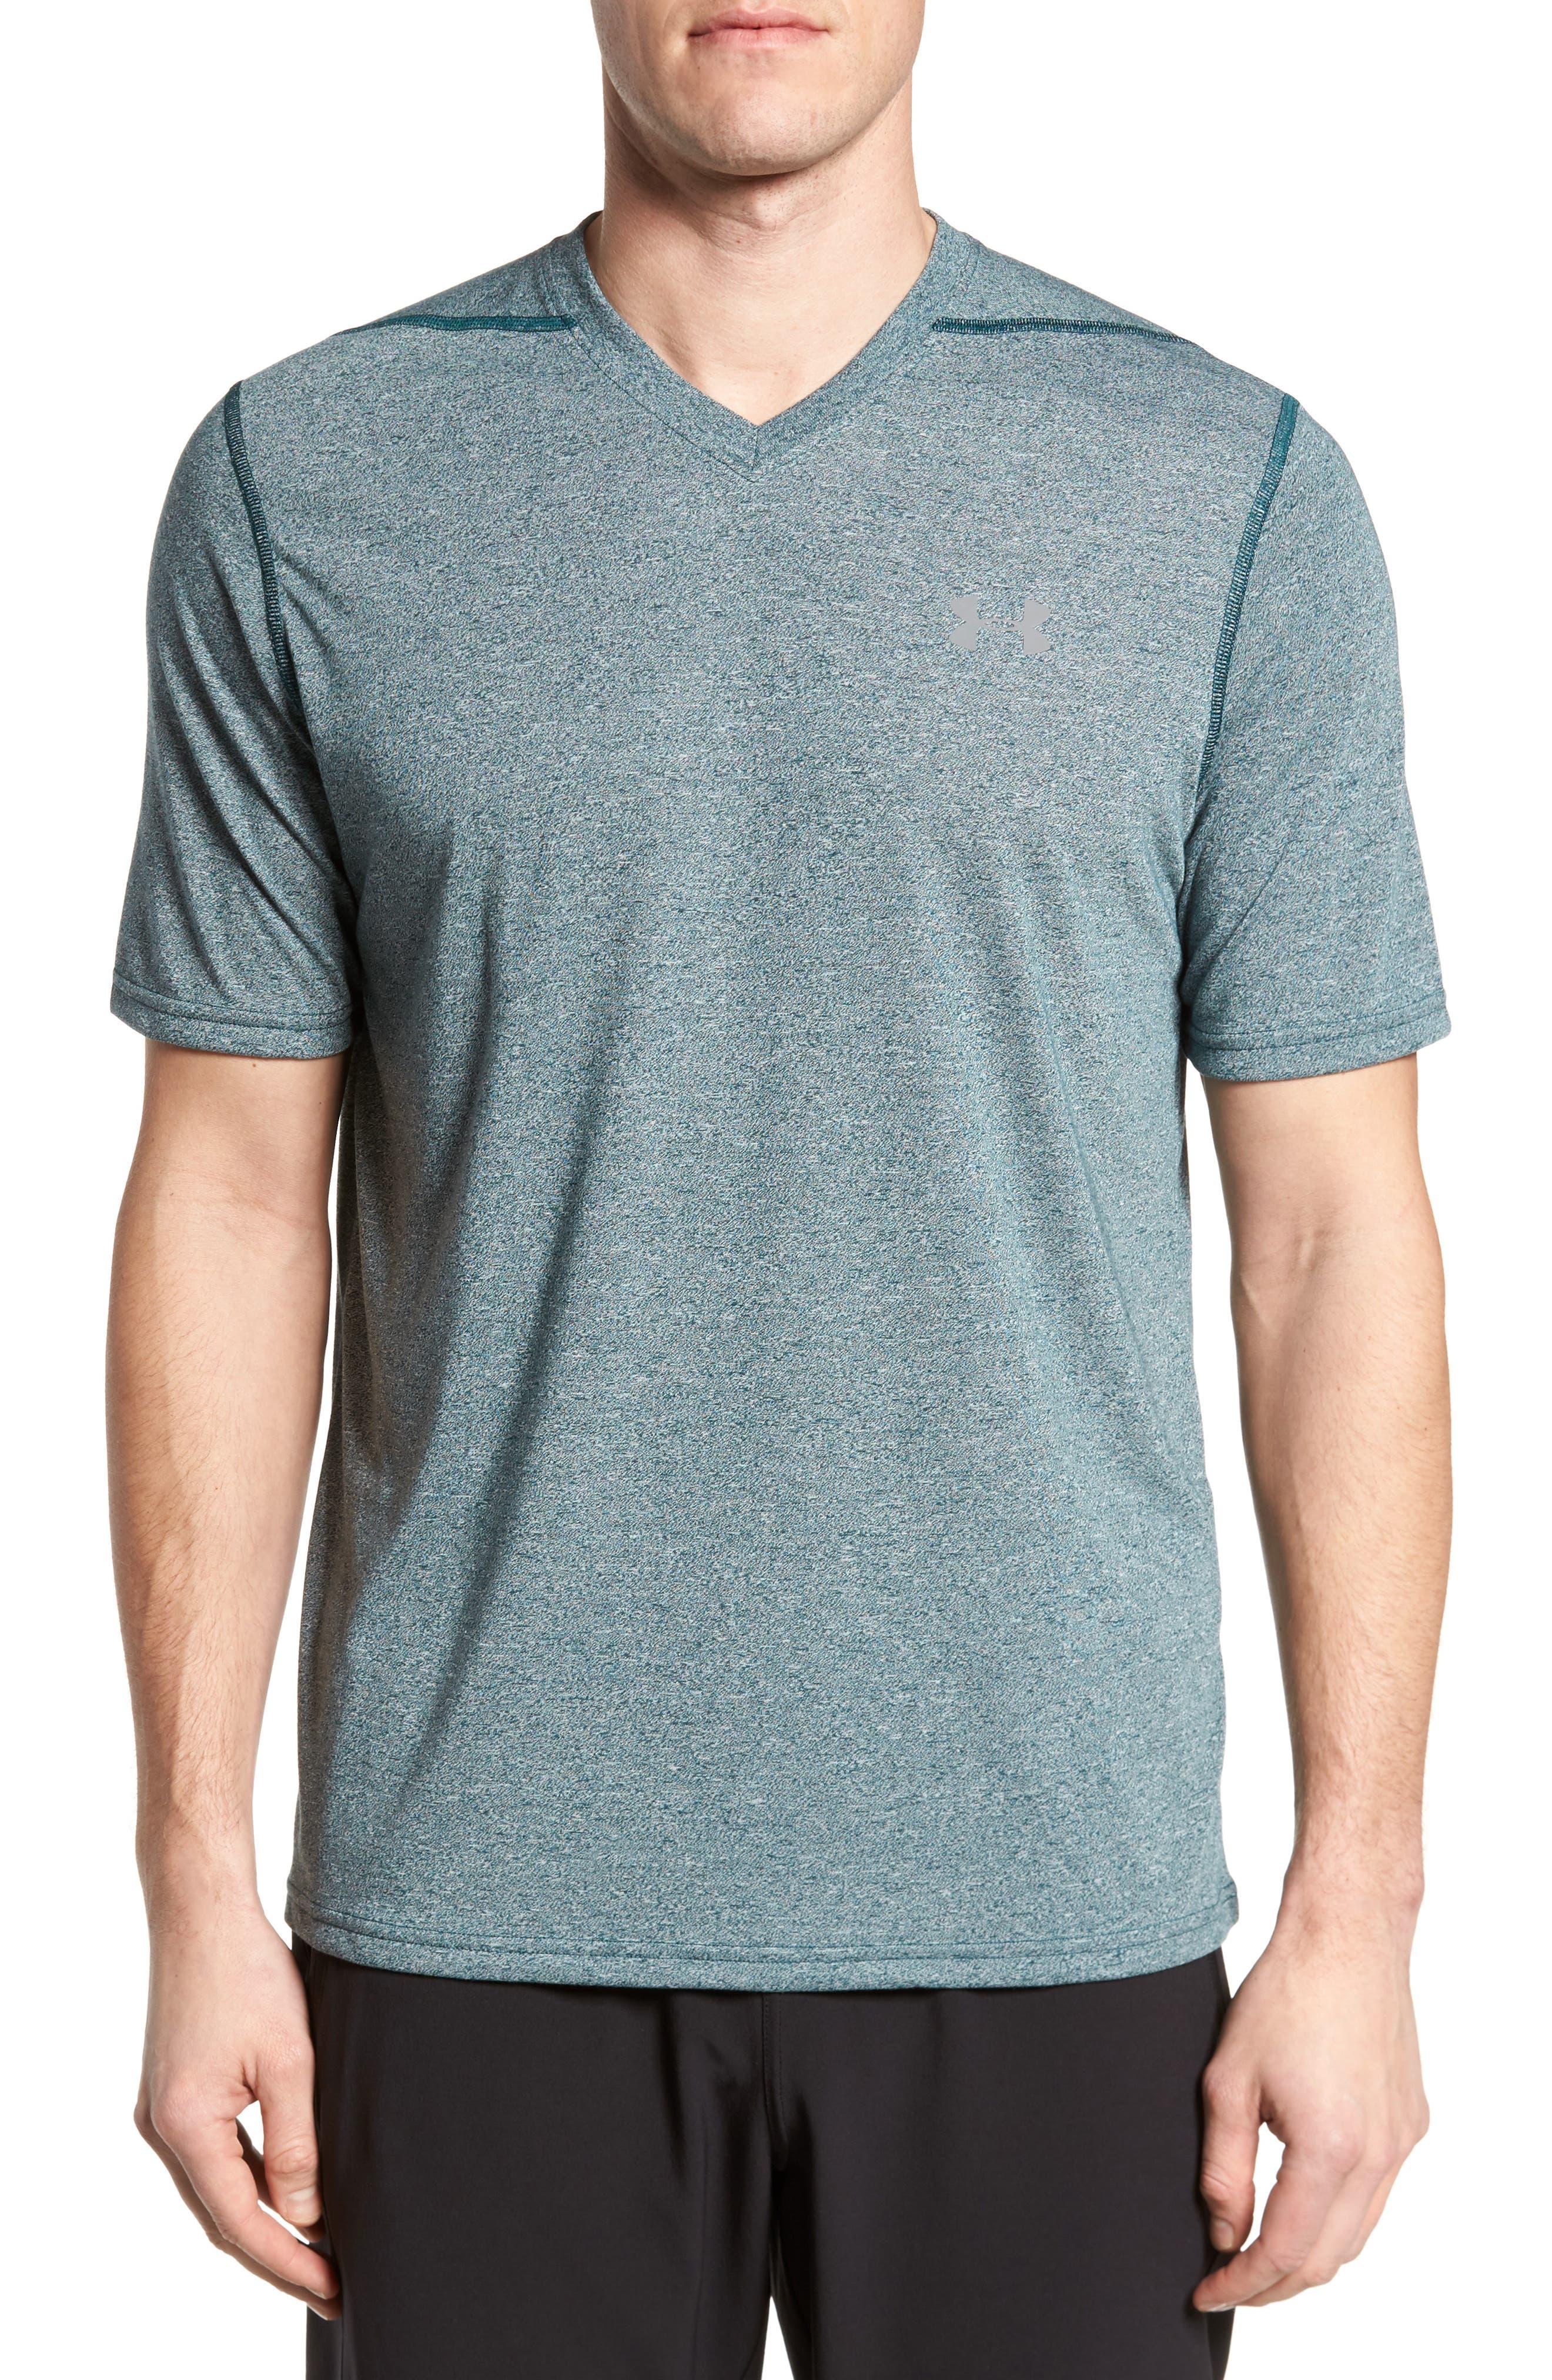 Regular Fit Threadborne T-Shirt,                             Main thumbnail 1, color,                             300